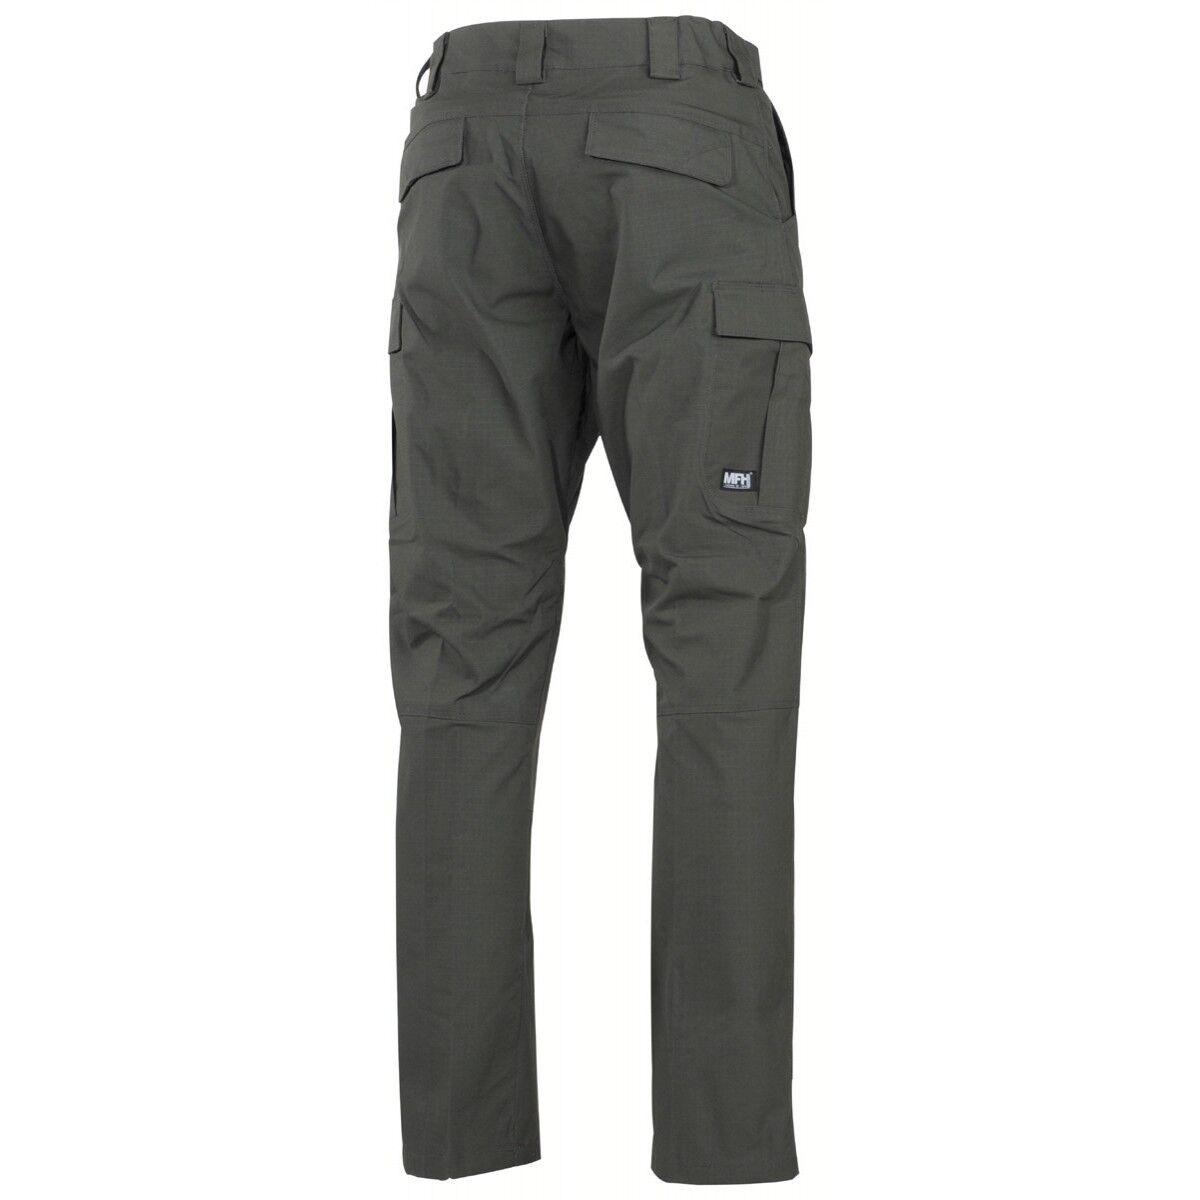 Pantaloni Pants MFH Ripstop Teflon Lycra Lycra Lycra Impermeabili Caccia Outdoor Militare OD 6b4fd2